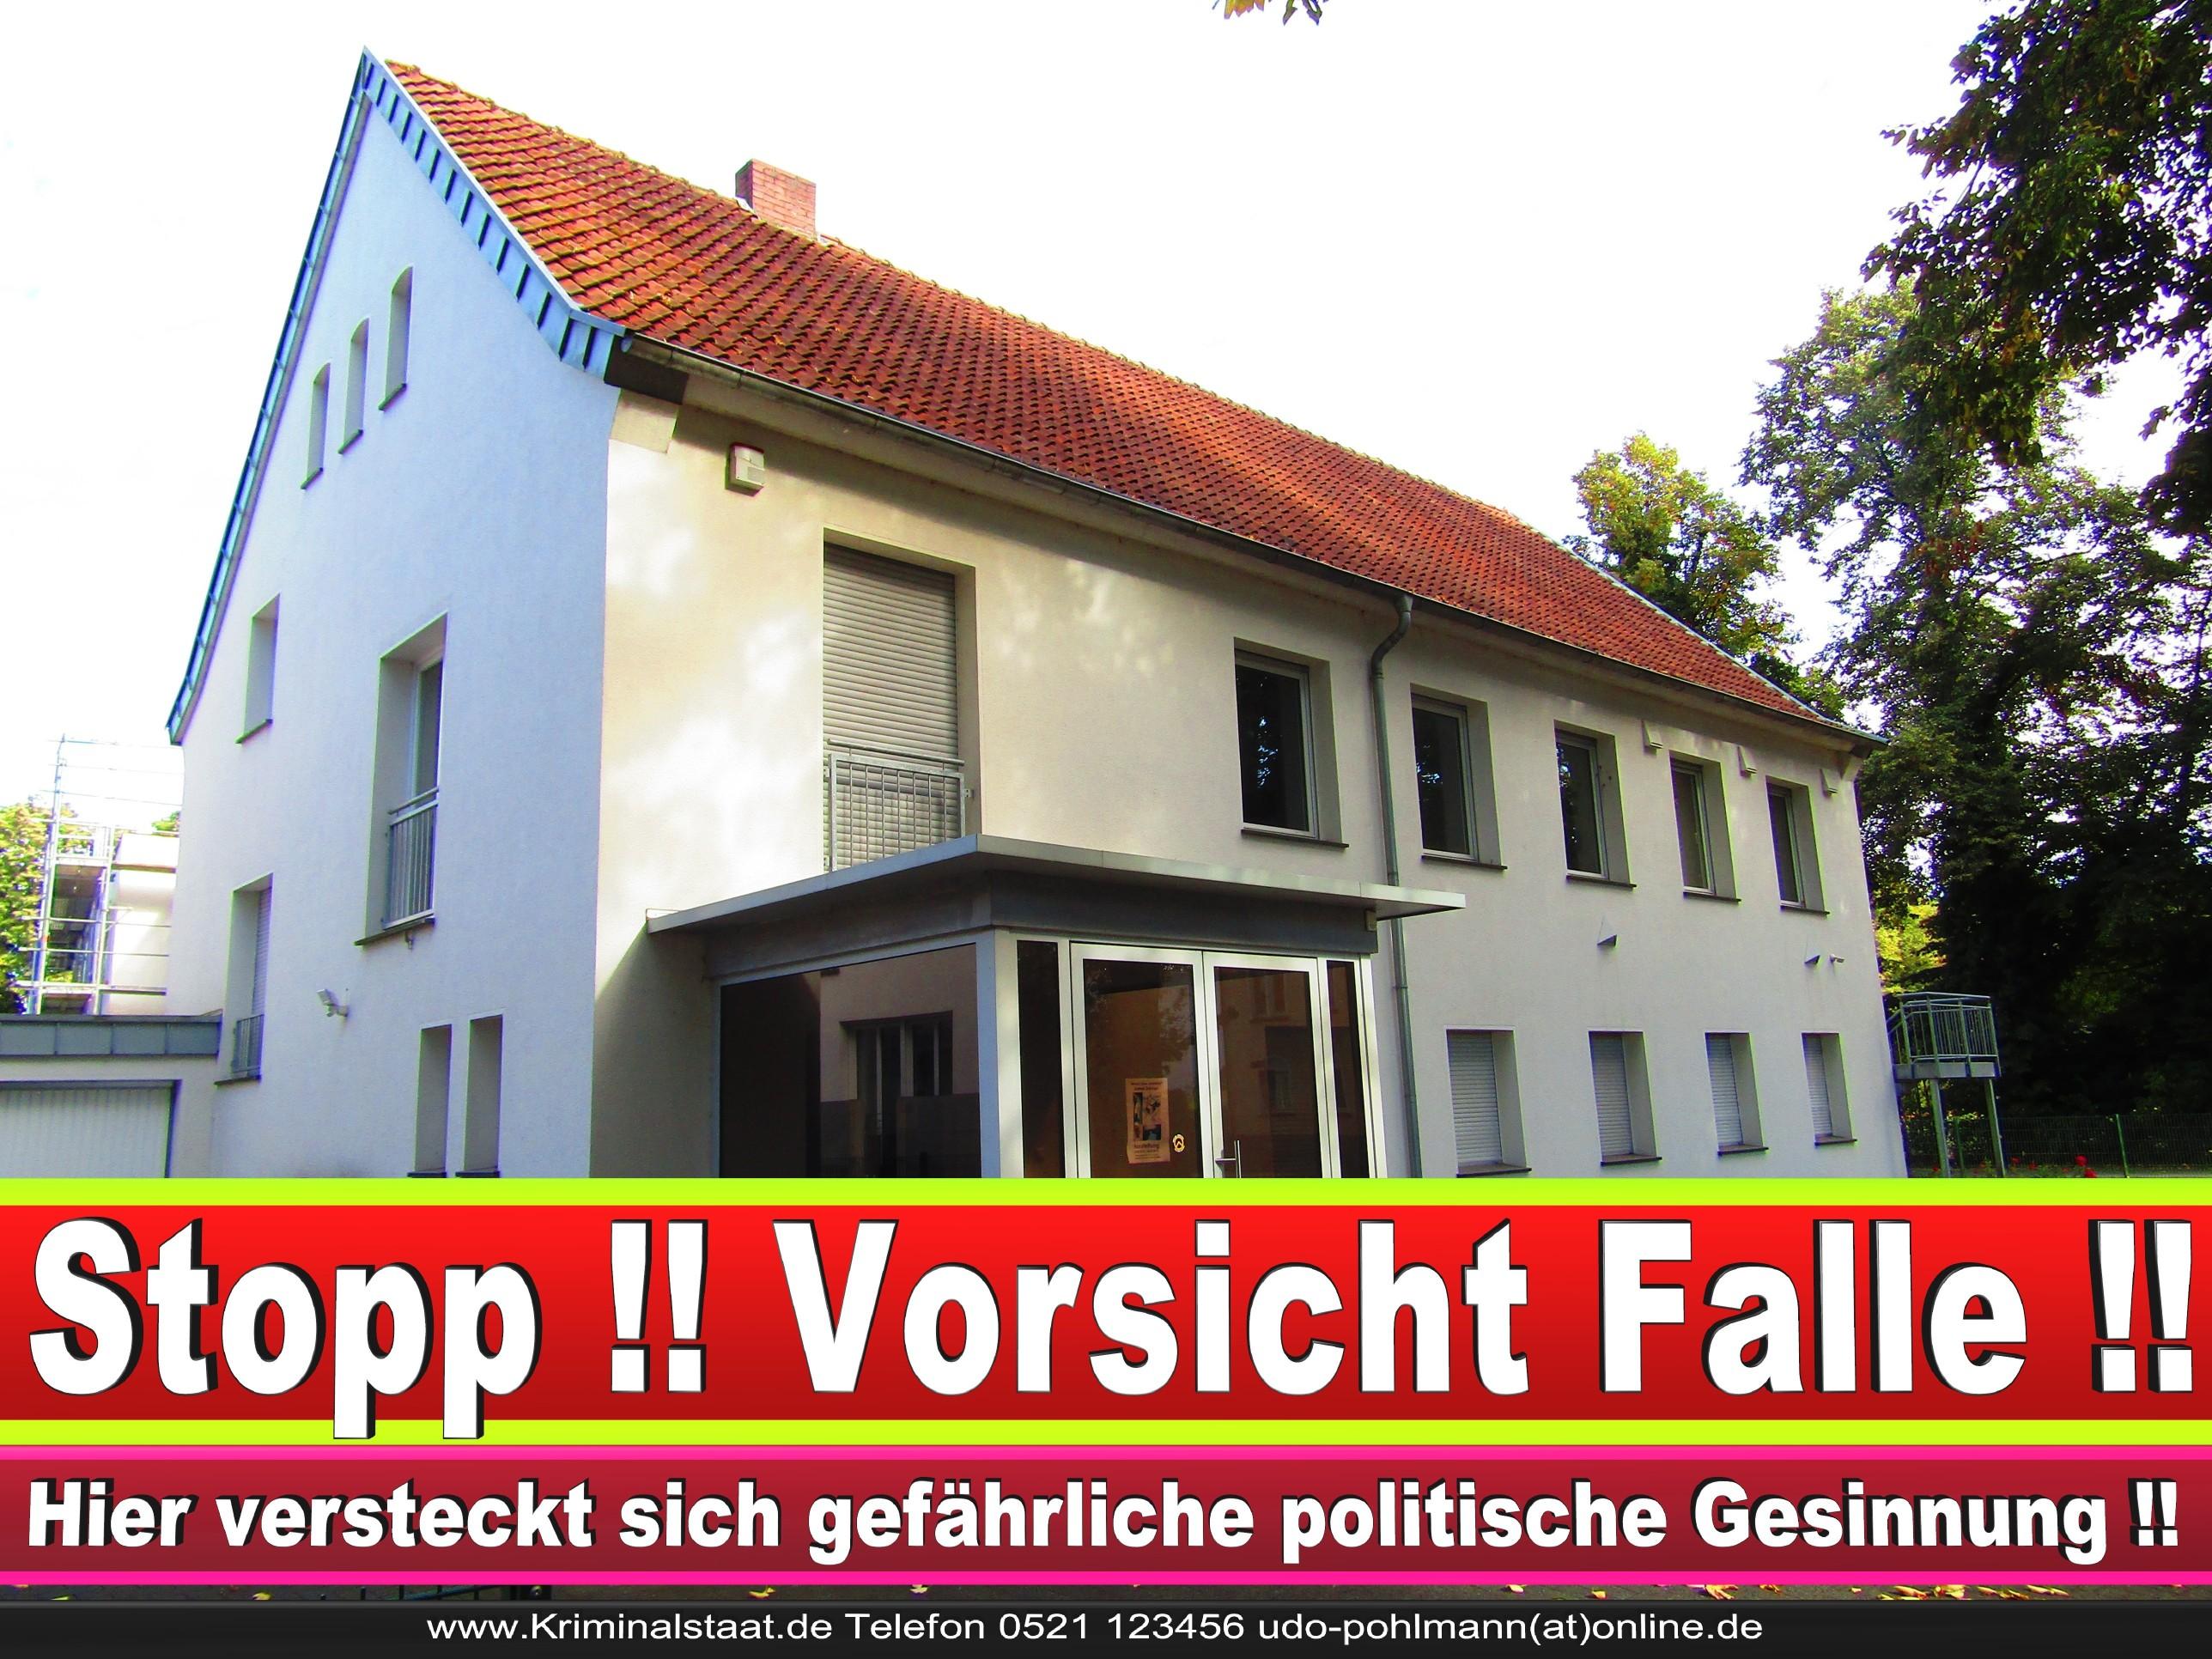 CDU GÜTERSLOH 3 LANDTAGSWAHL BUNDESTAGSWAHL BÜRGERMEISTERWAHL 1